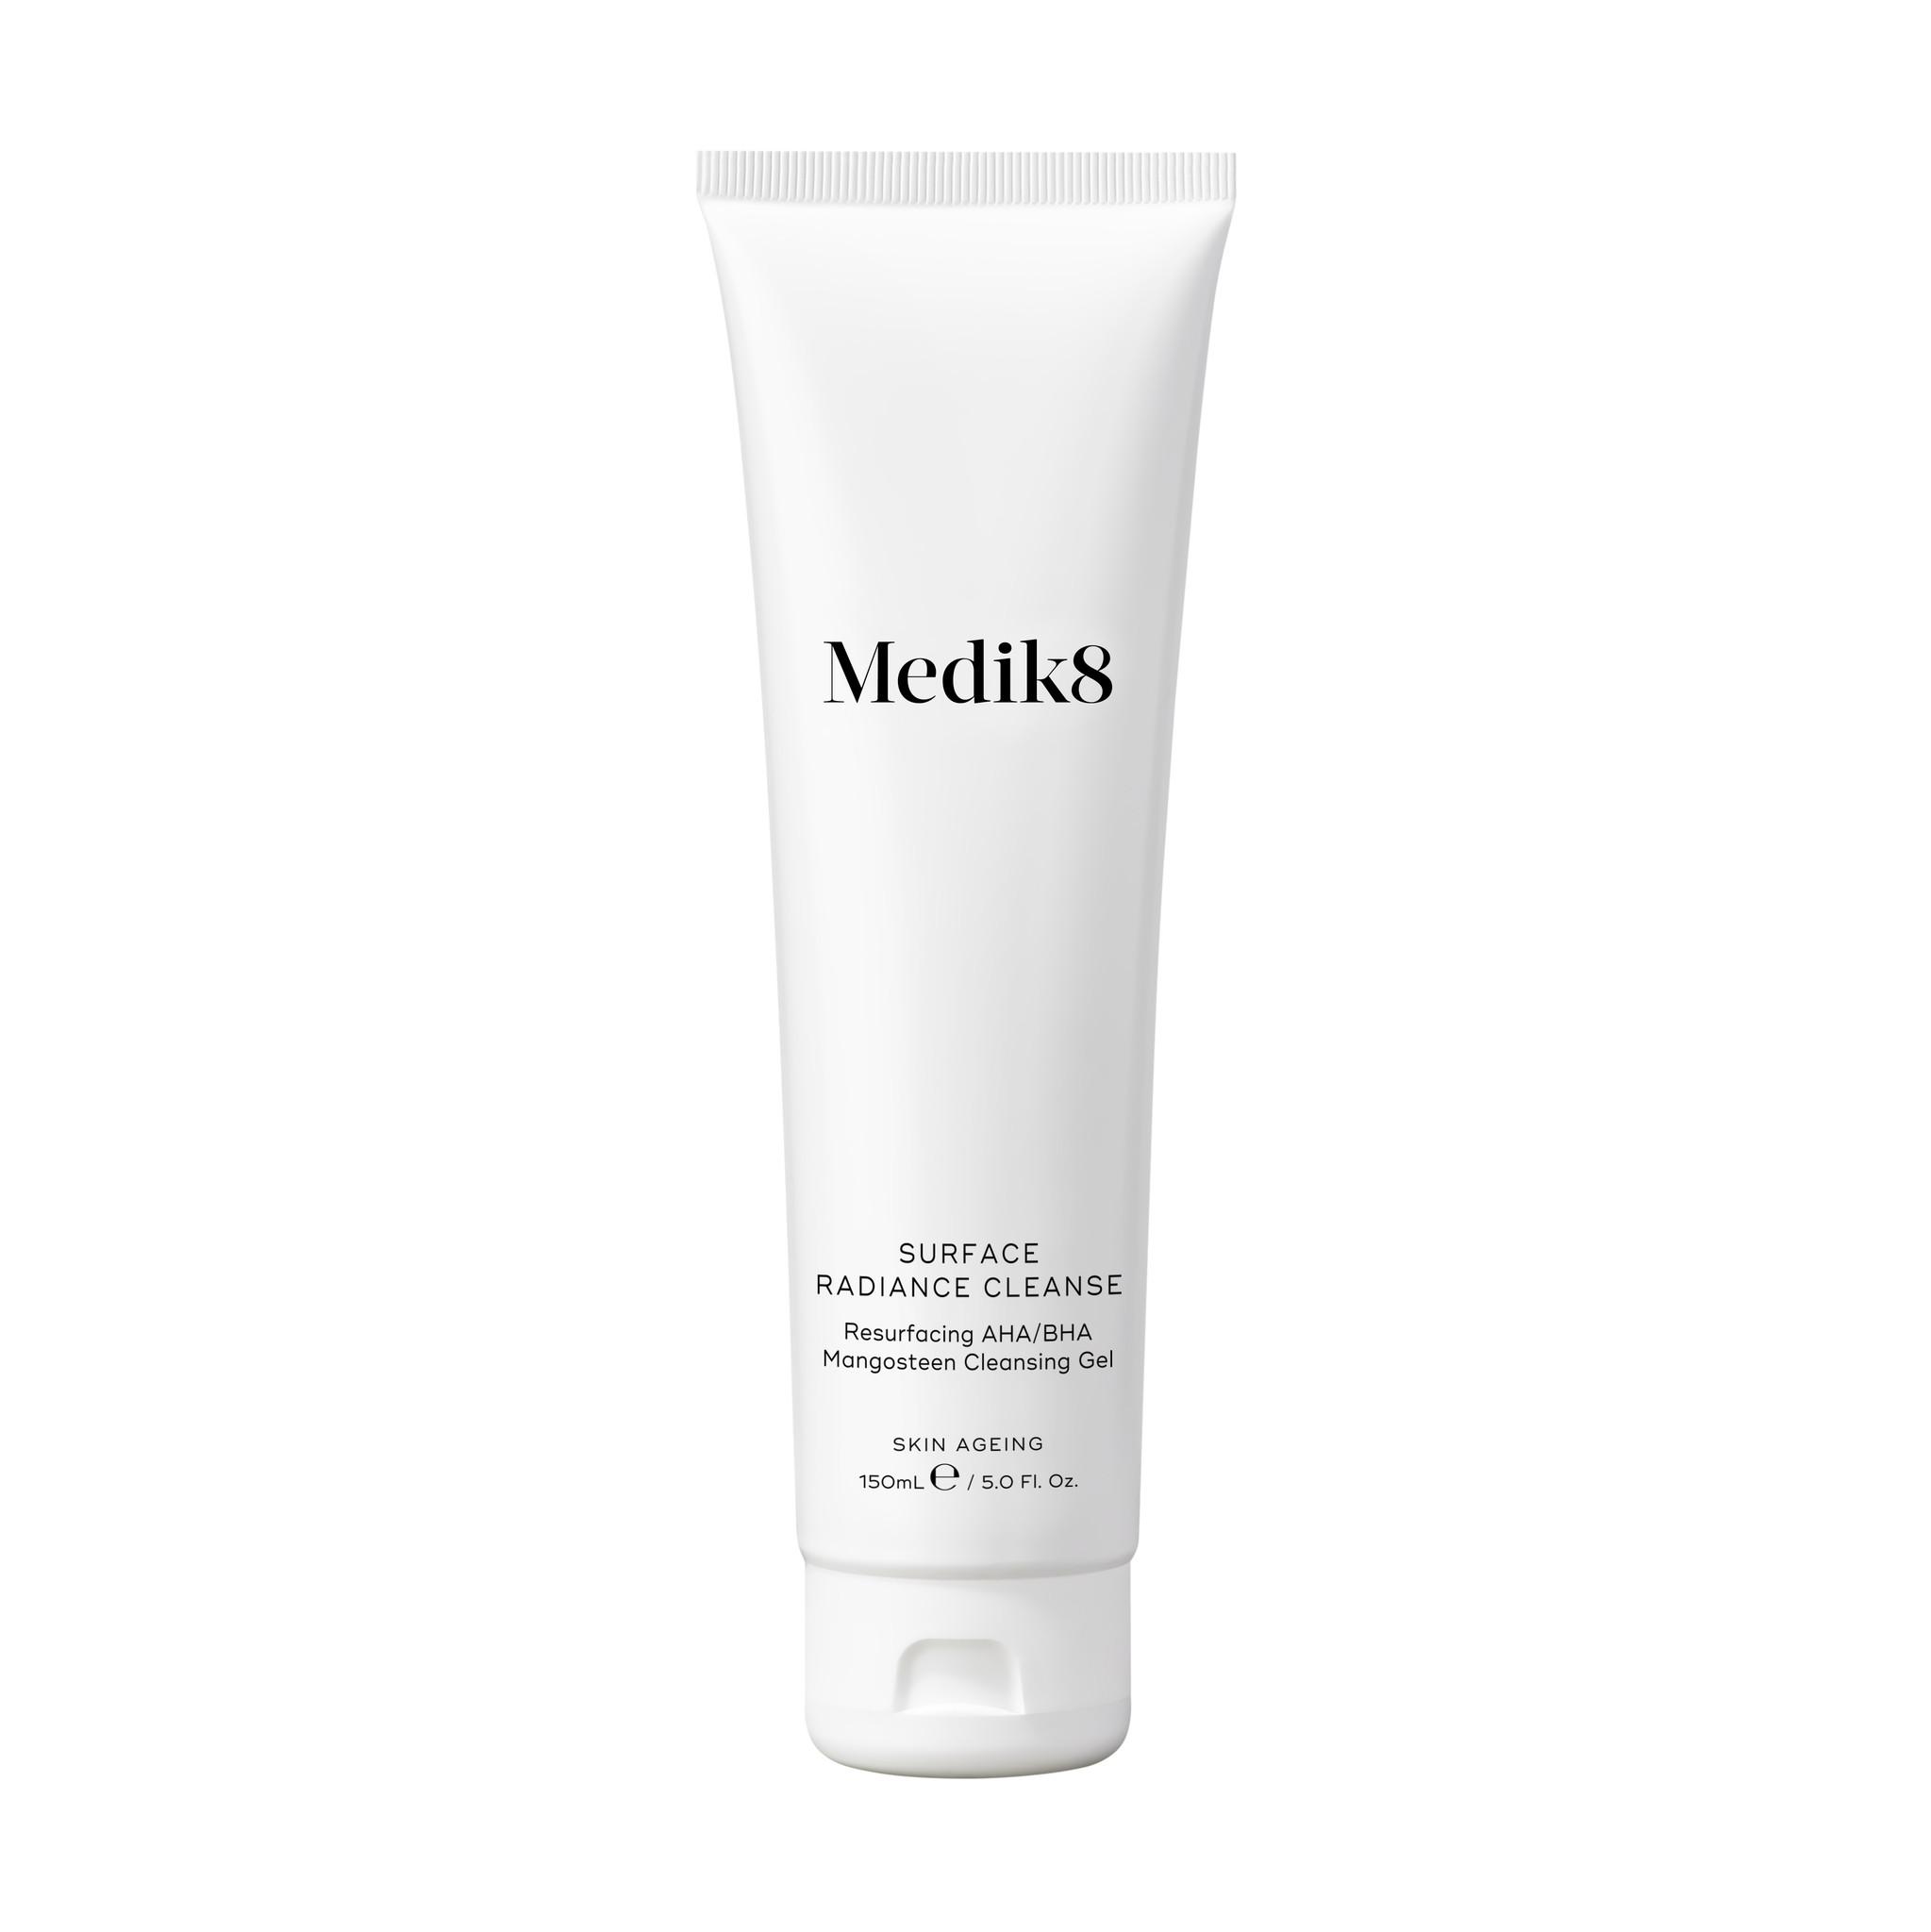 Medik8 Surface Radiance Cleanse | Resurfacing AHA/BHA Mangosteen Cleansing Gel | 150ml